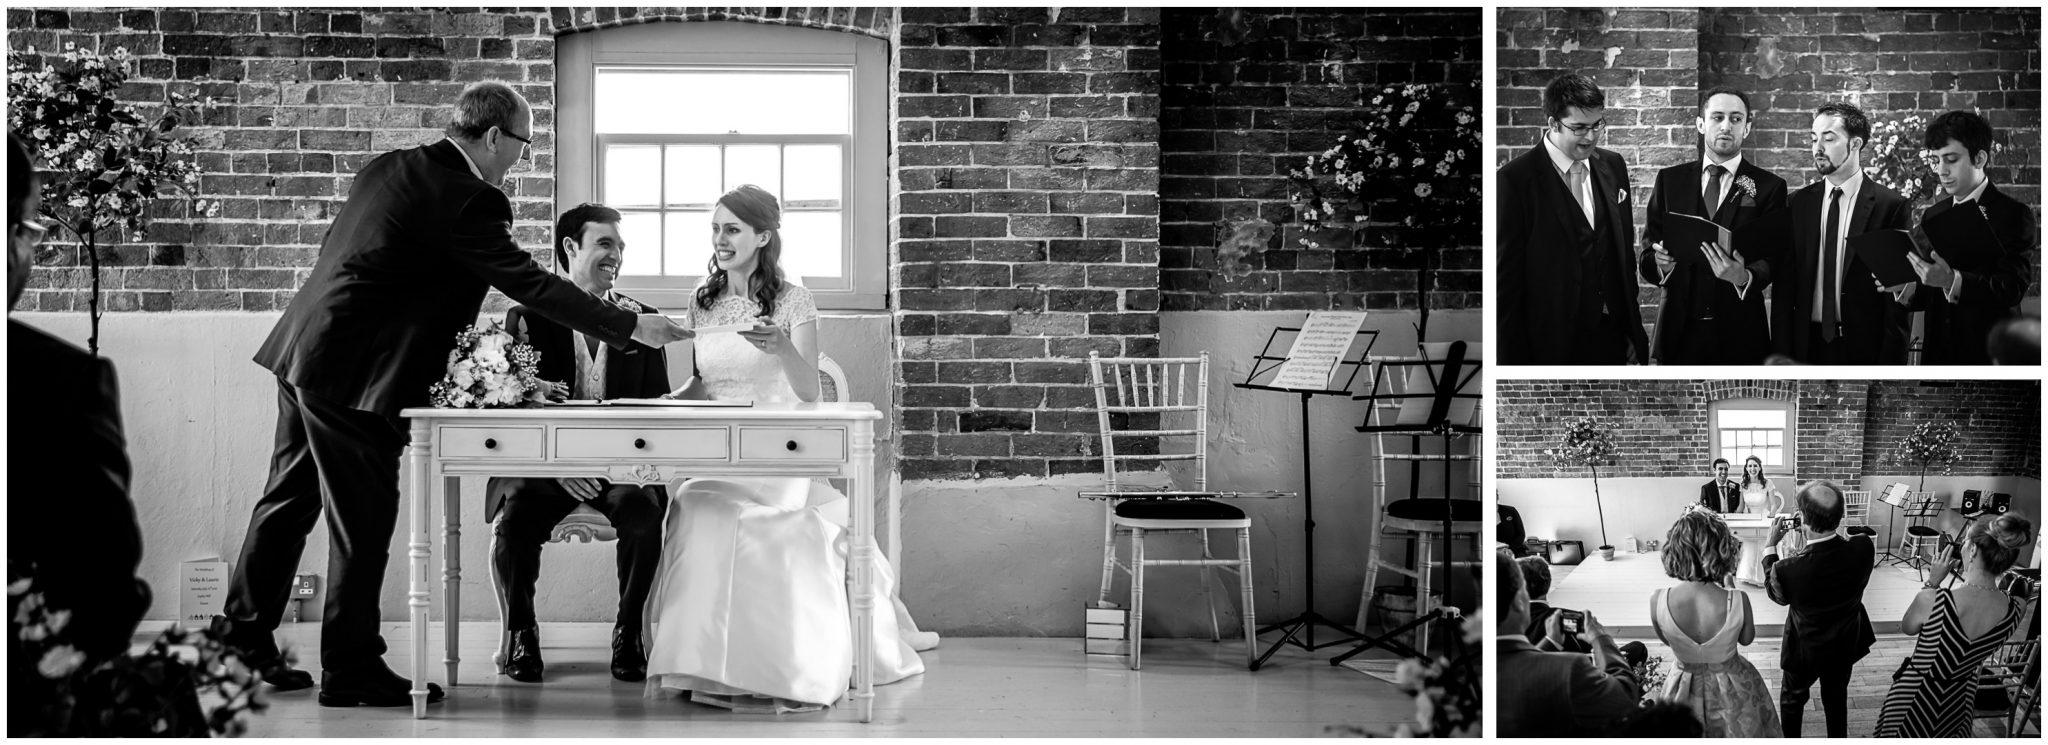 Sopley Mill Summer wedding bride receives marriage certificate